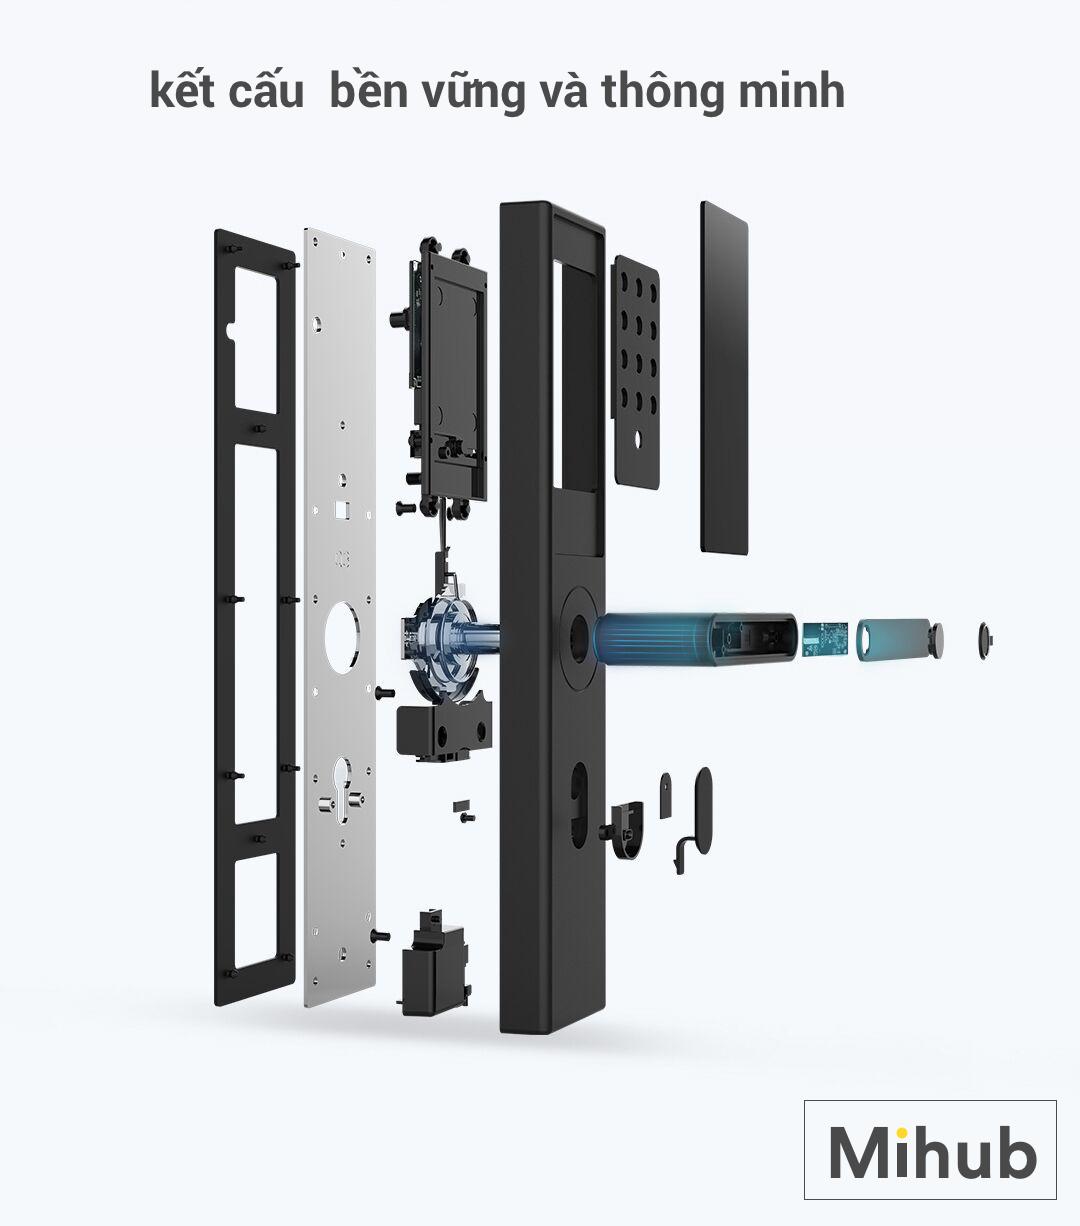 Address specializing in selling smart door locks Xiaomi Youpin OJJ X1 genuine Saigon city